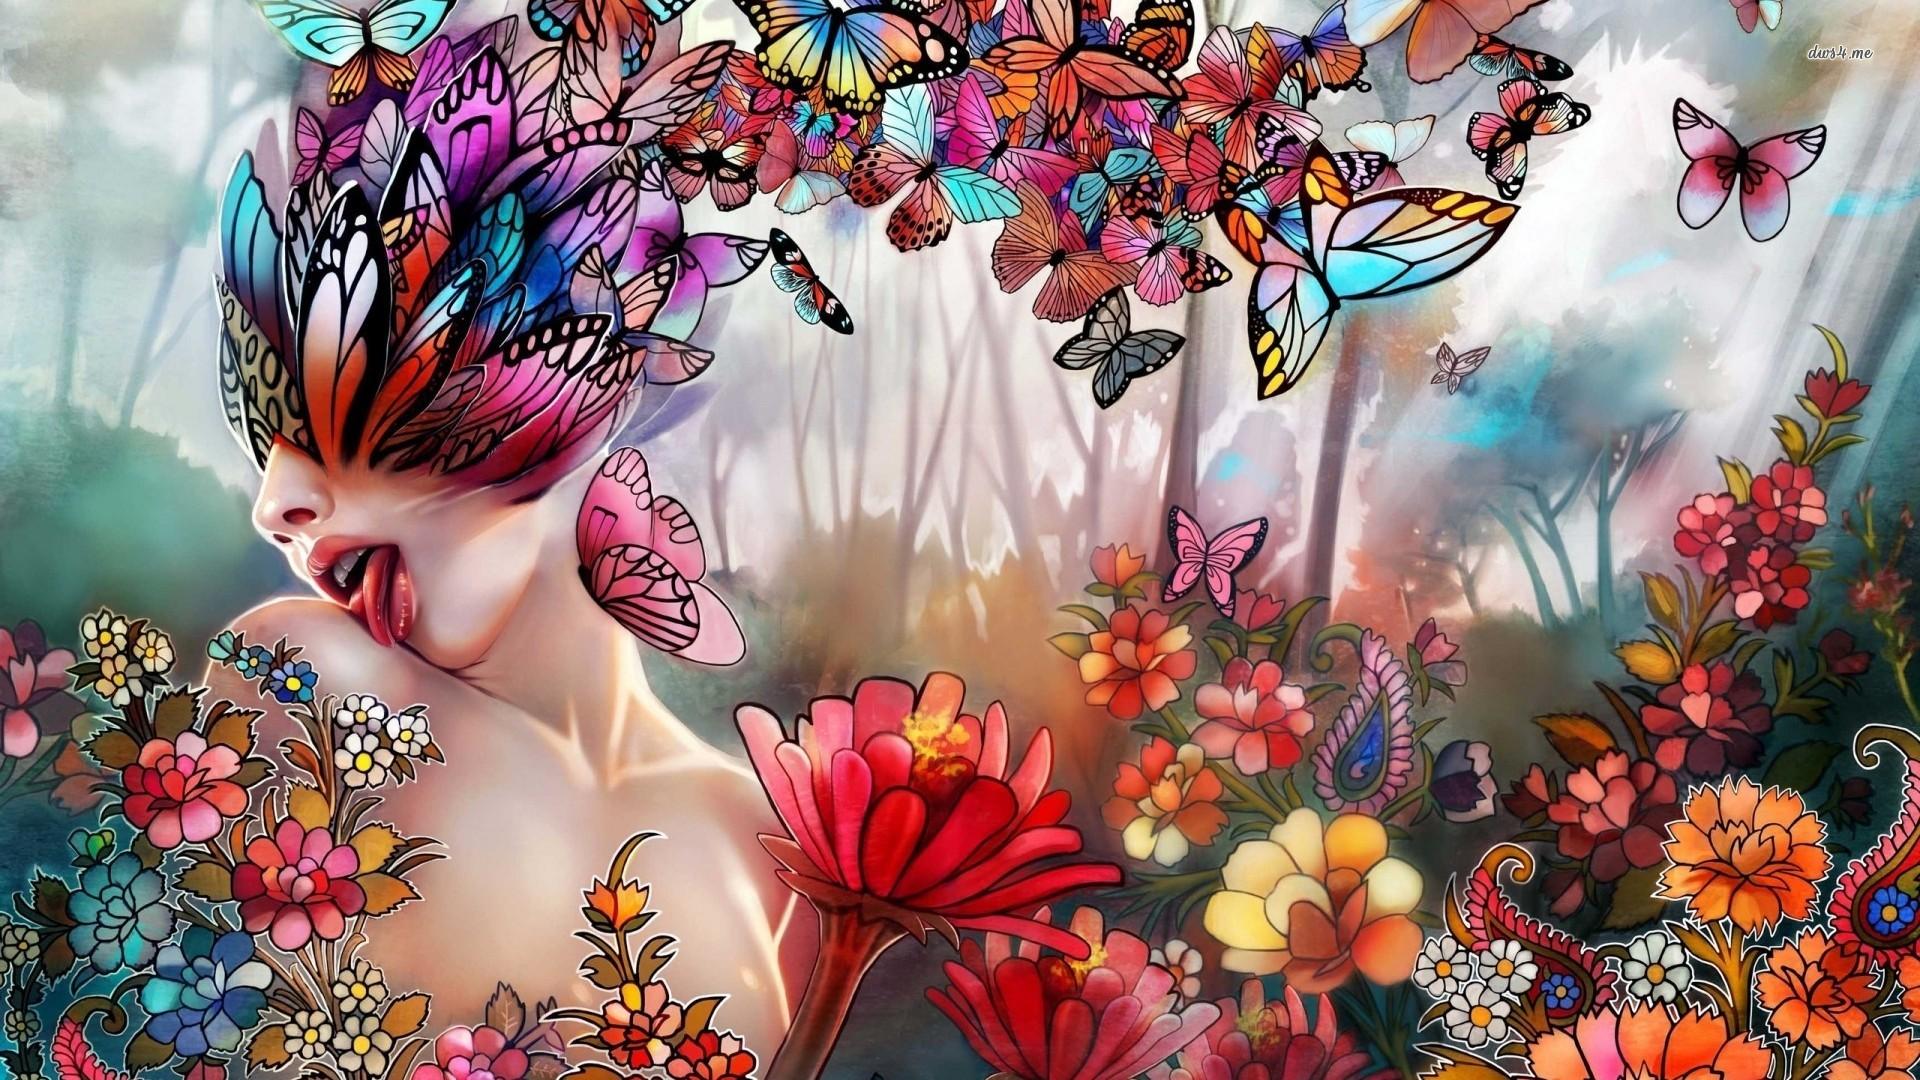 15989-butterfly-woman-1920x1080-artistic-wallpaper.jpg